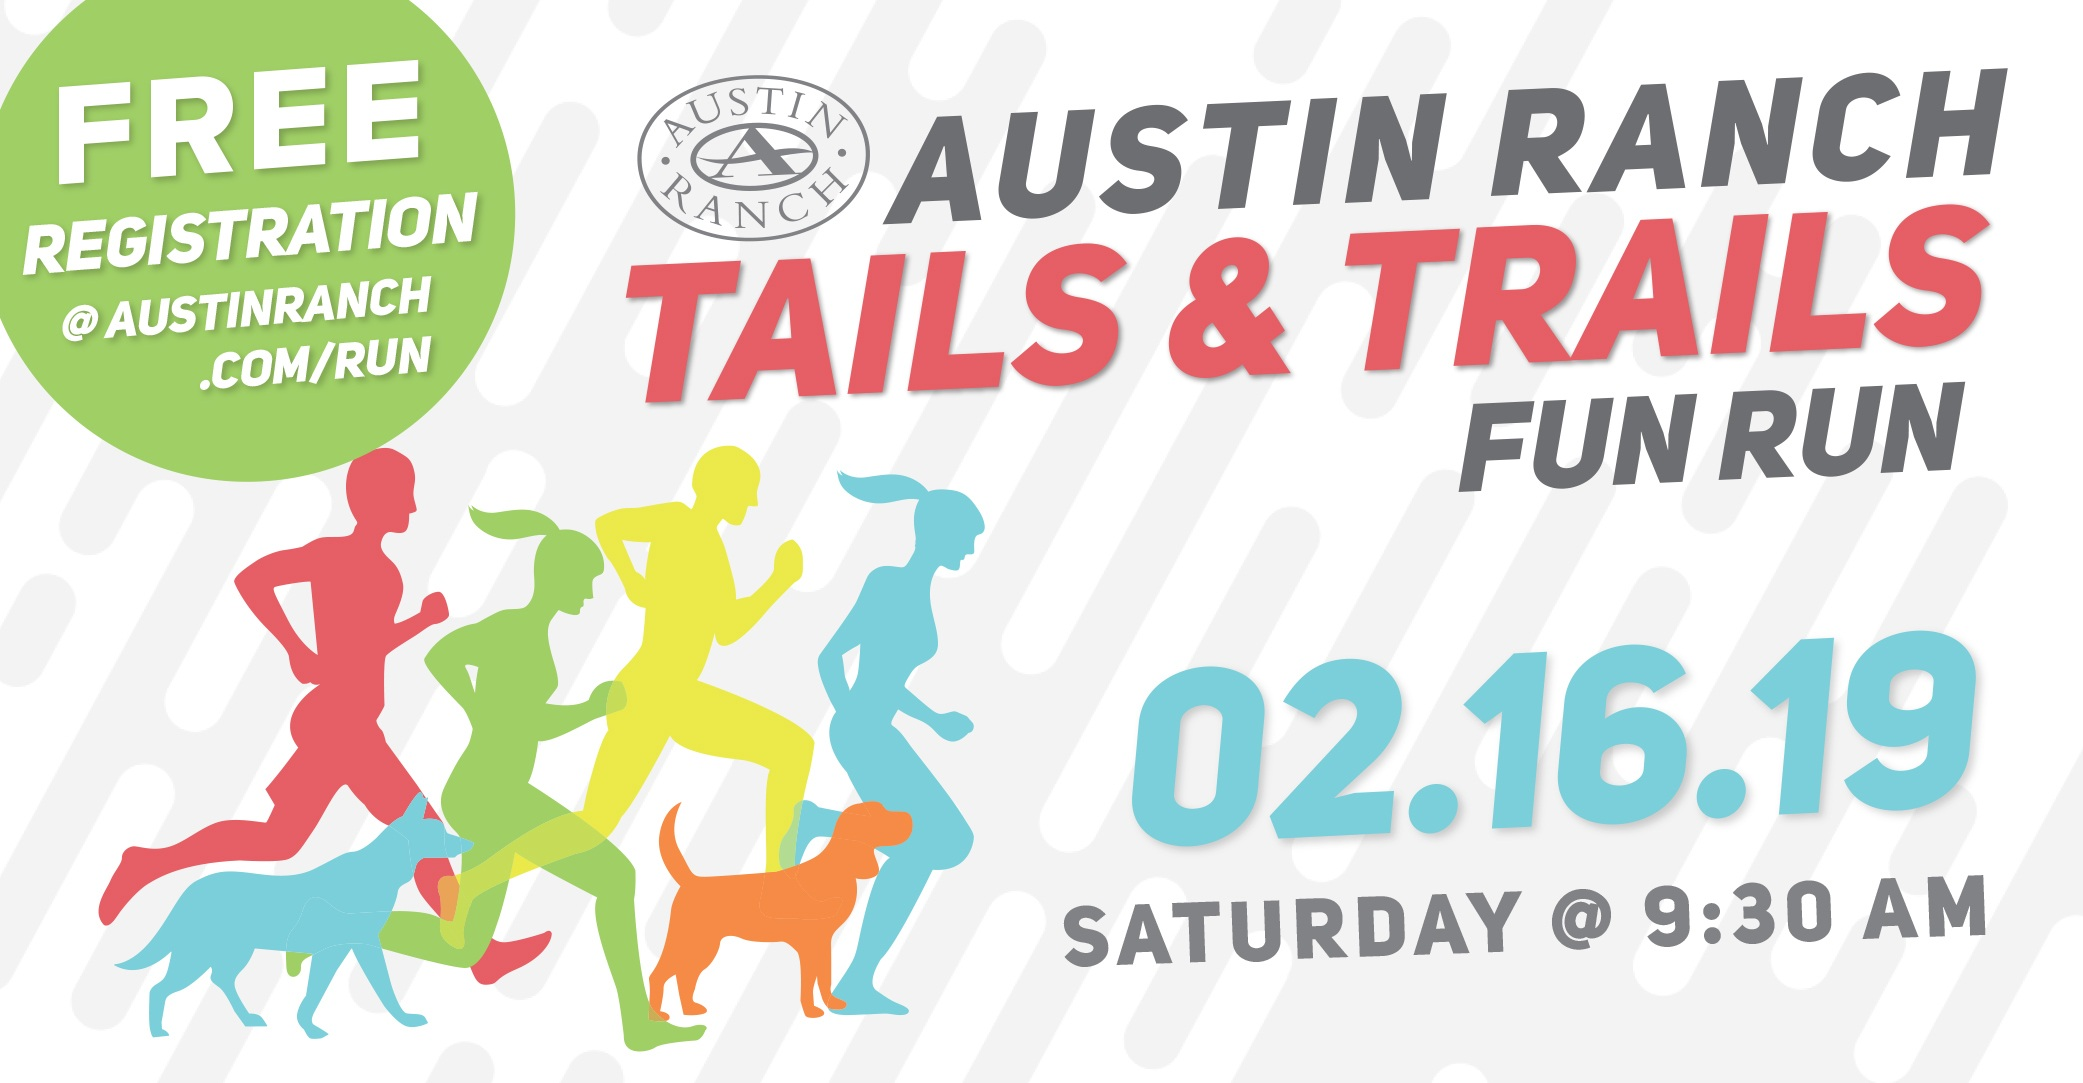 Austin Ranch 5K Fun Run_Tails and trails